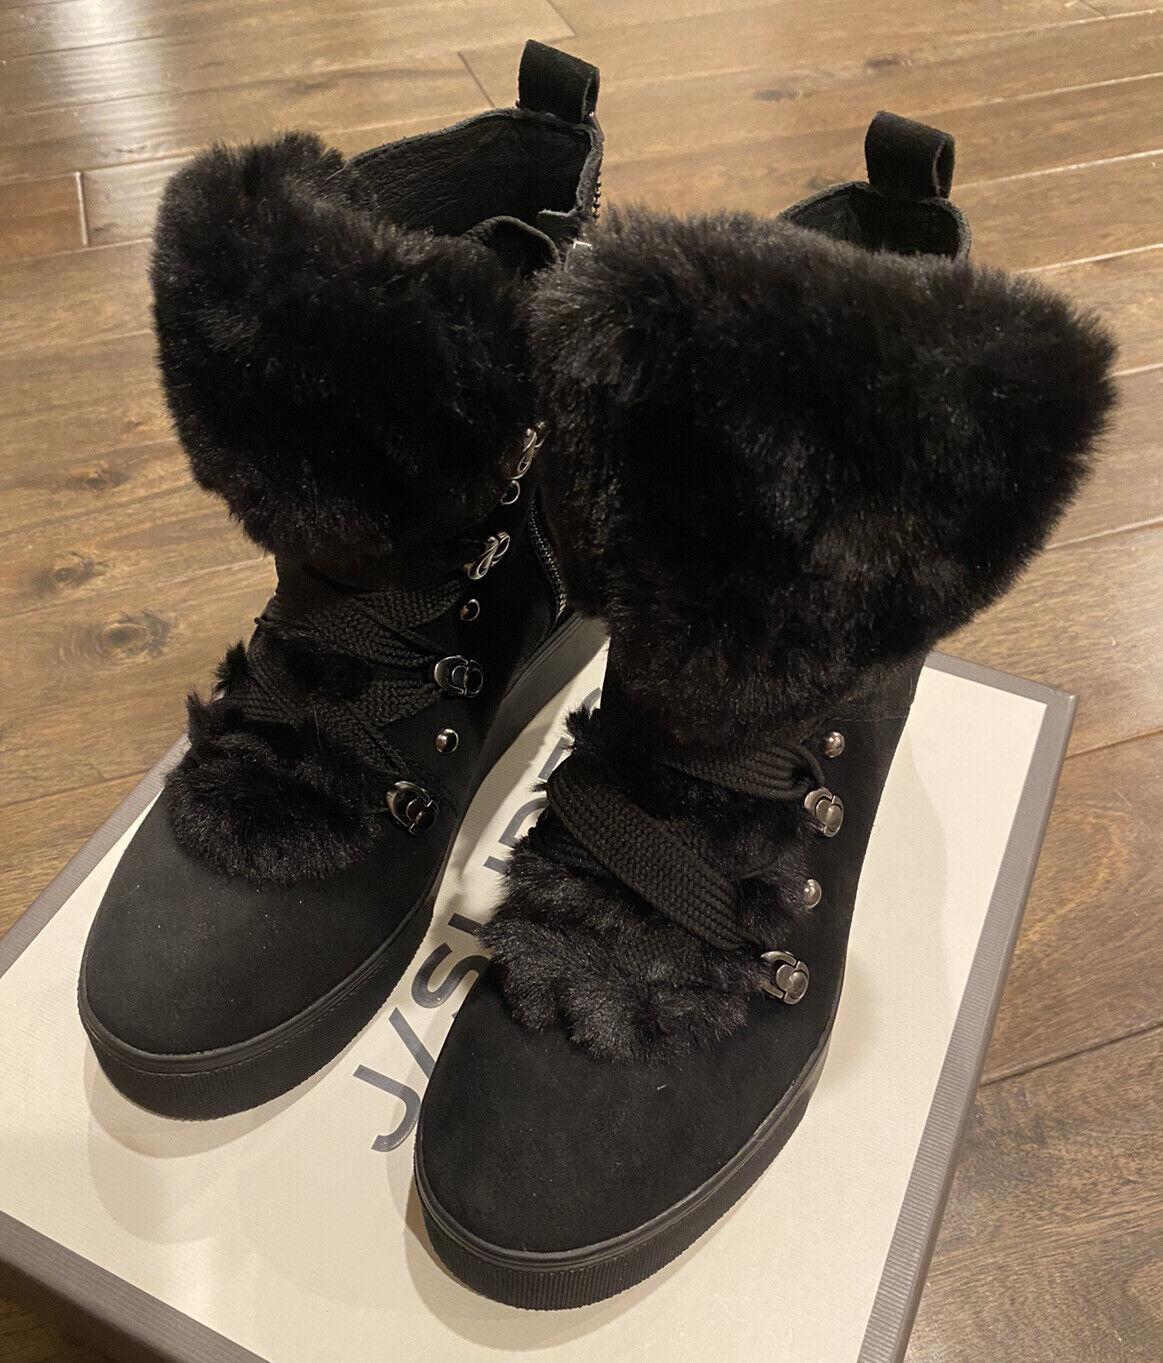 NEW J/Slides Womens Whitney Suede High Top Zipper Sneakers Black Size 8.5 NIB